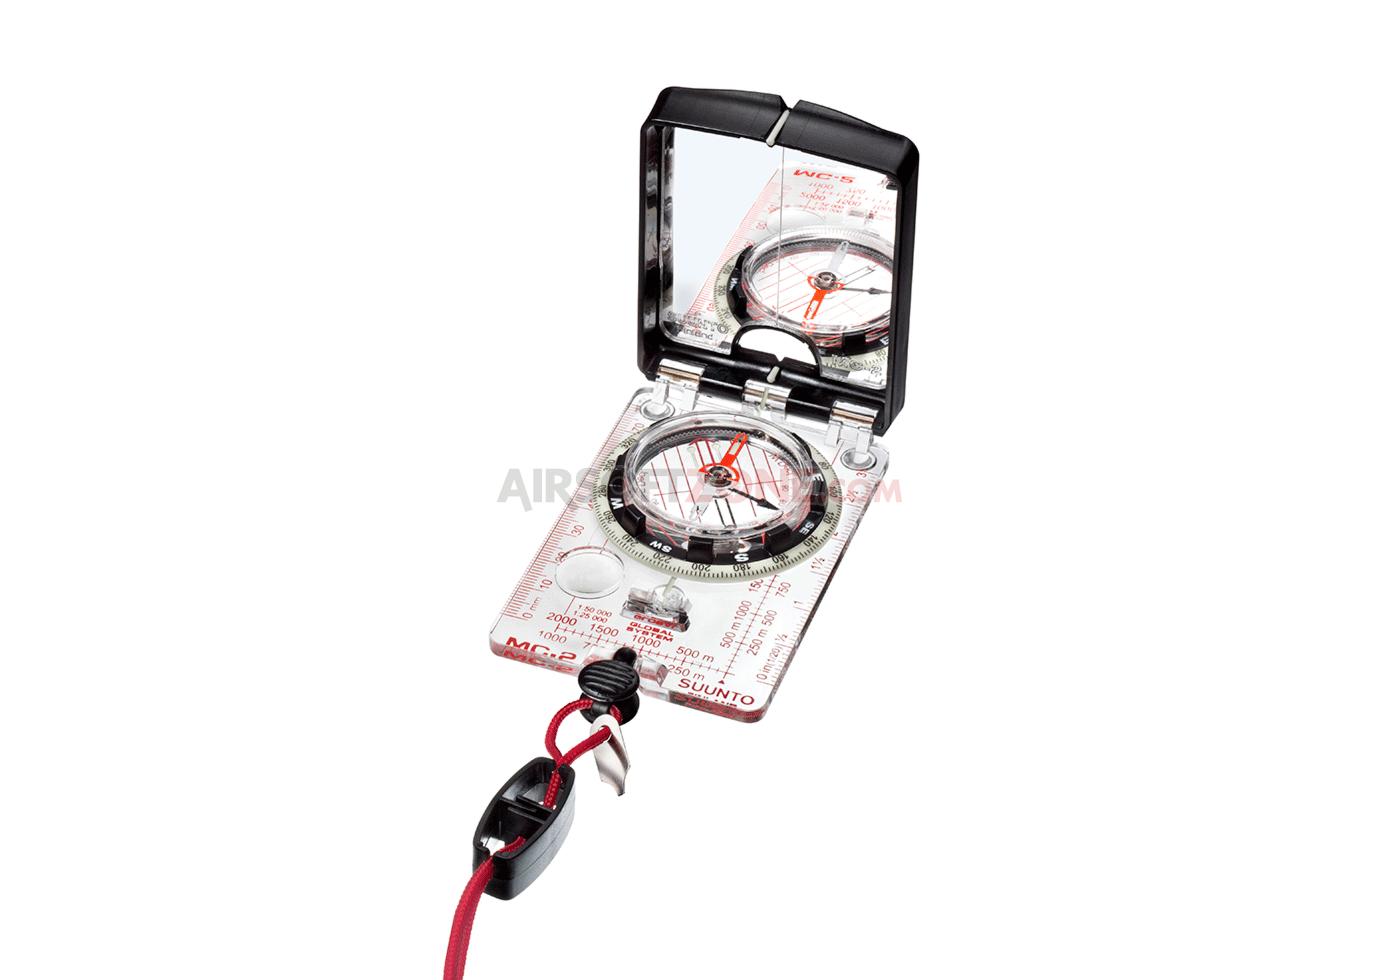 Mc 2 G Mirror Compass Suunto